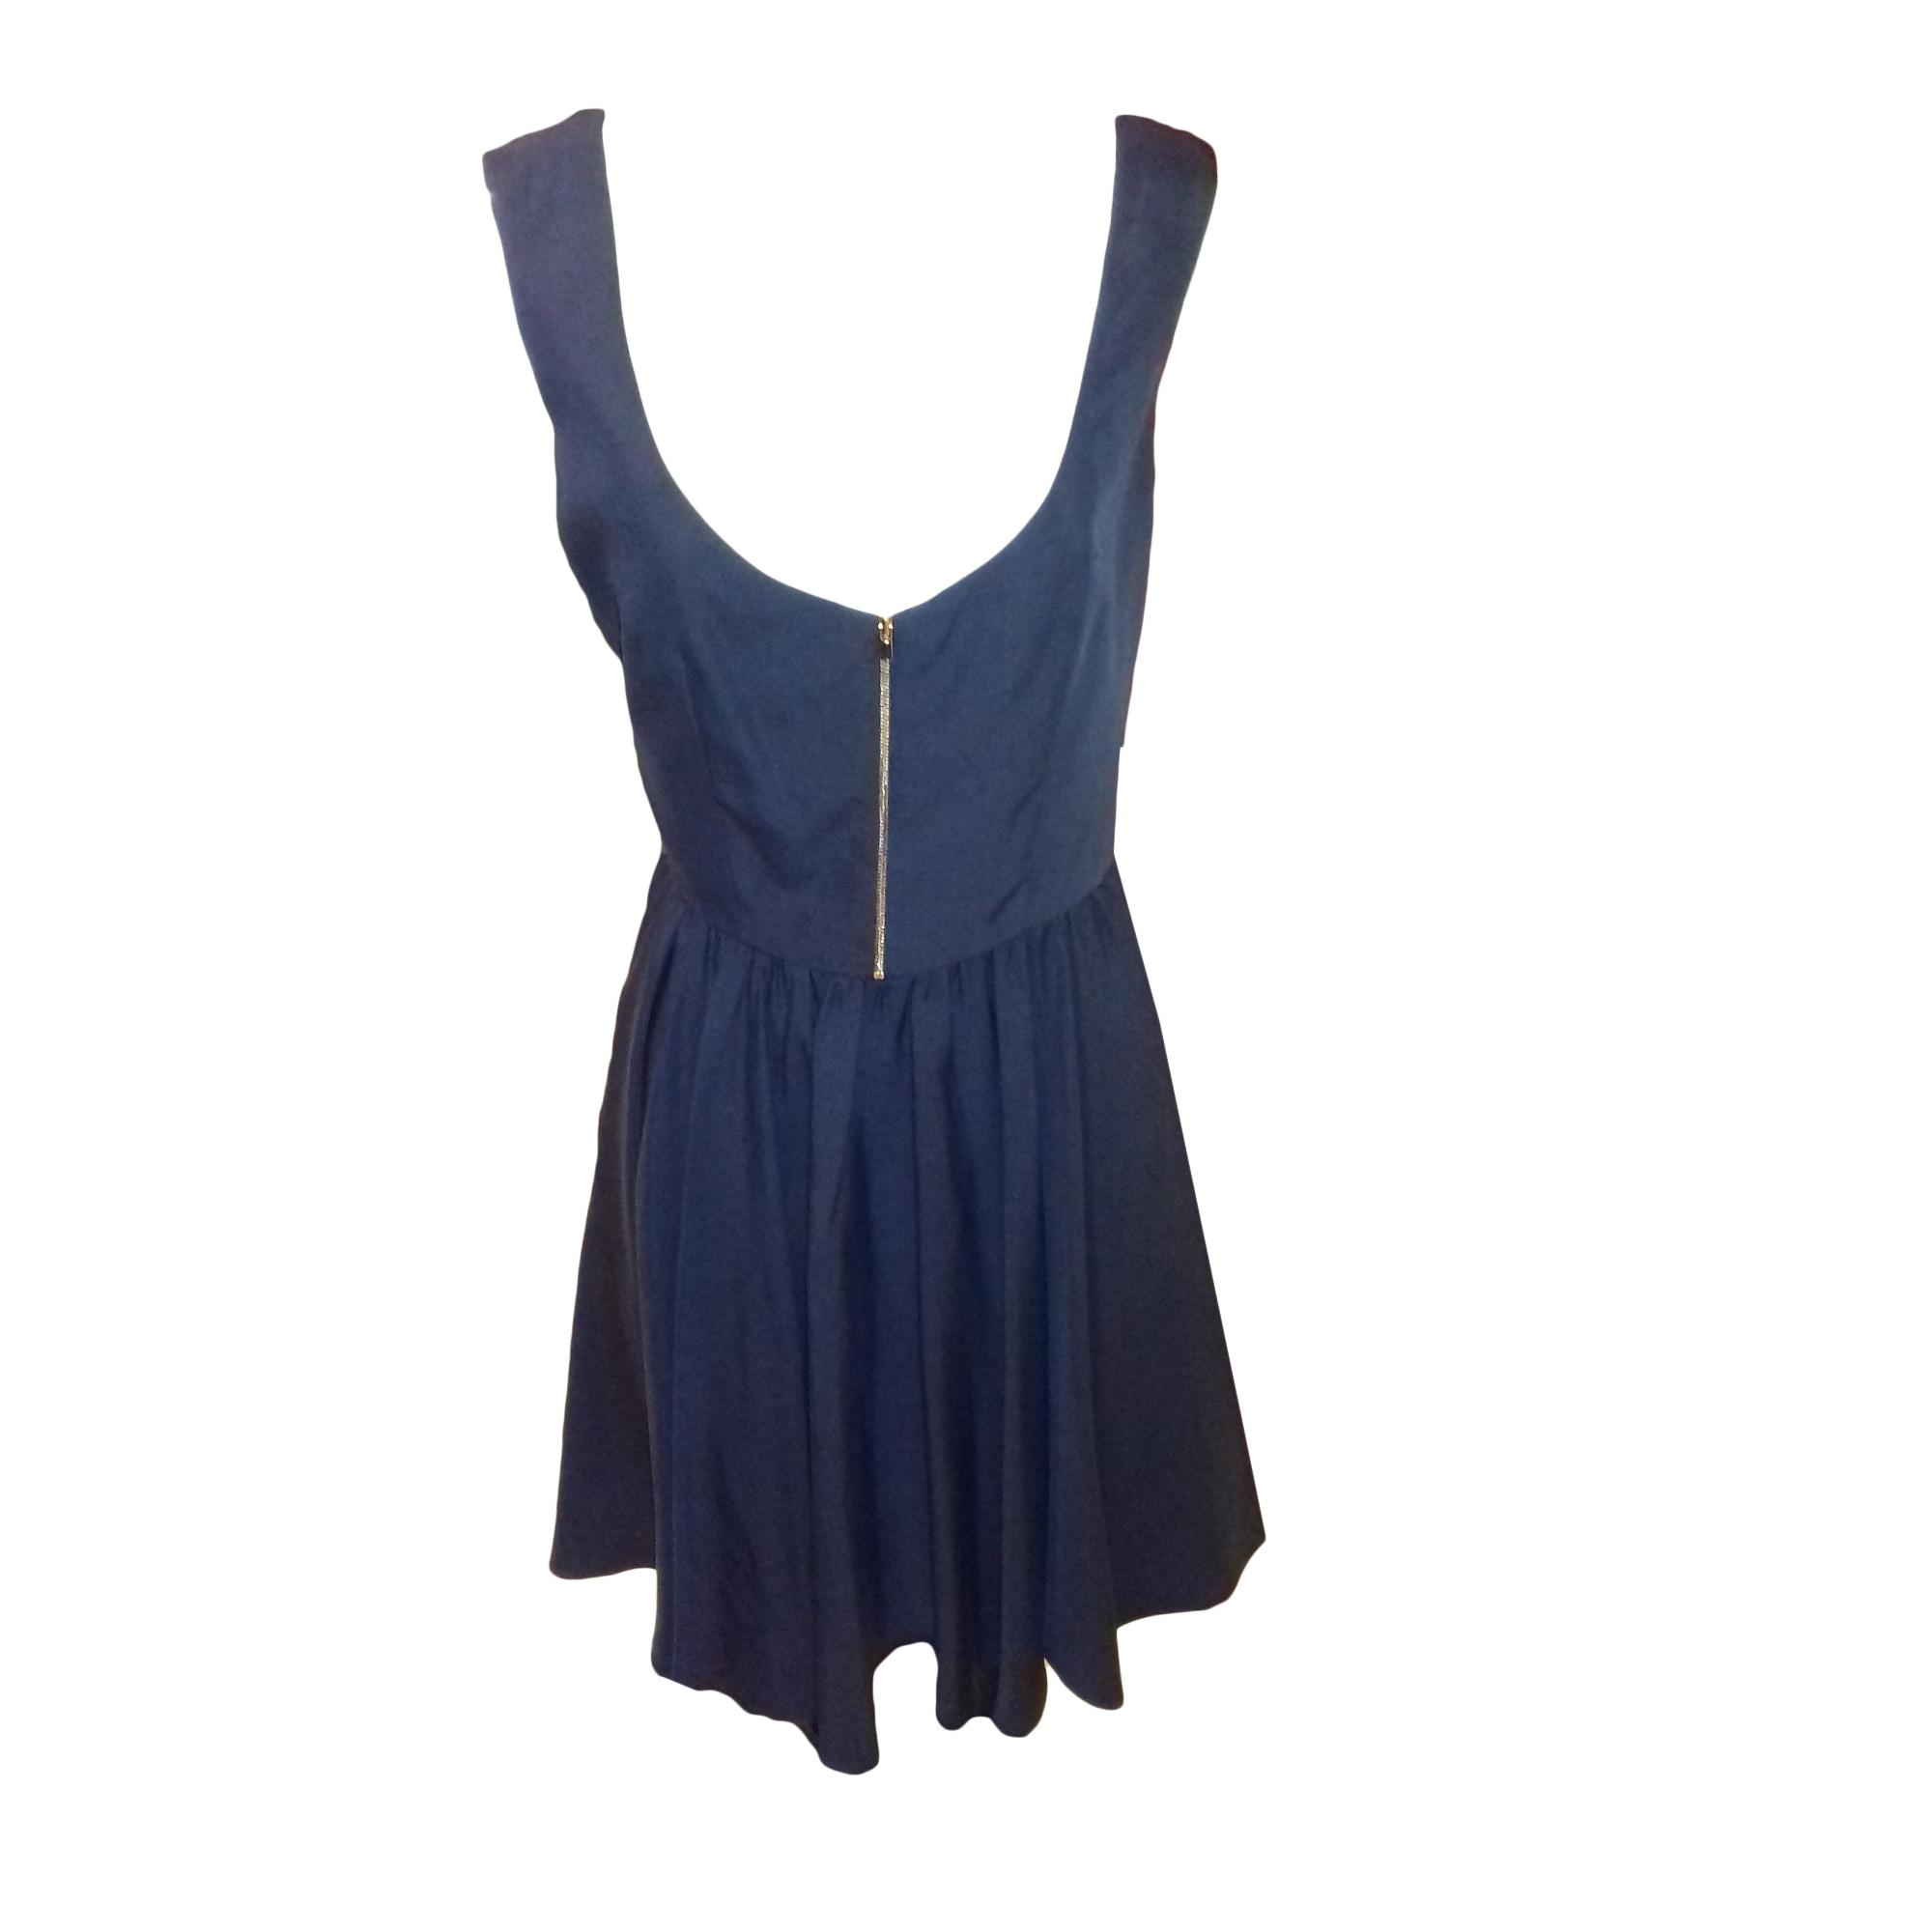 Robe Mi Longue Tara Jarmon 42 L Xl T4 Bleu 8996989